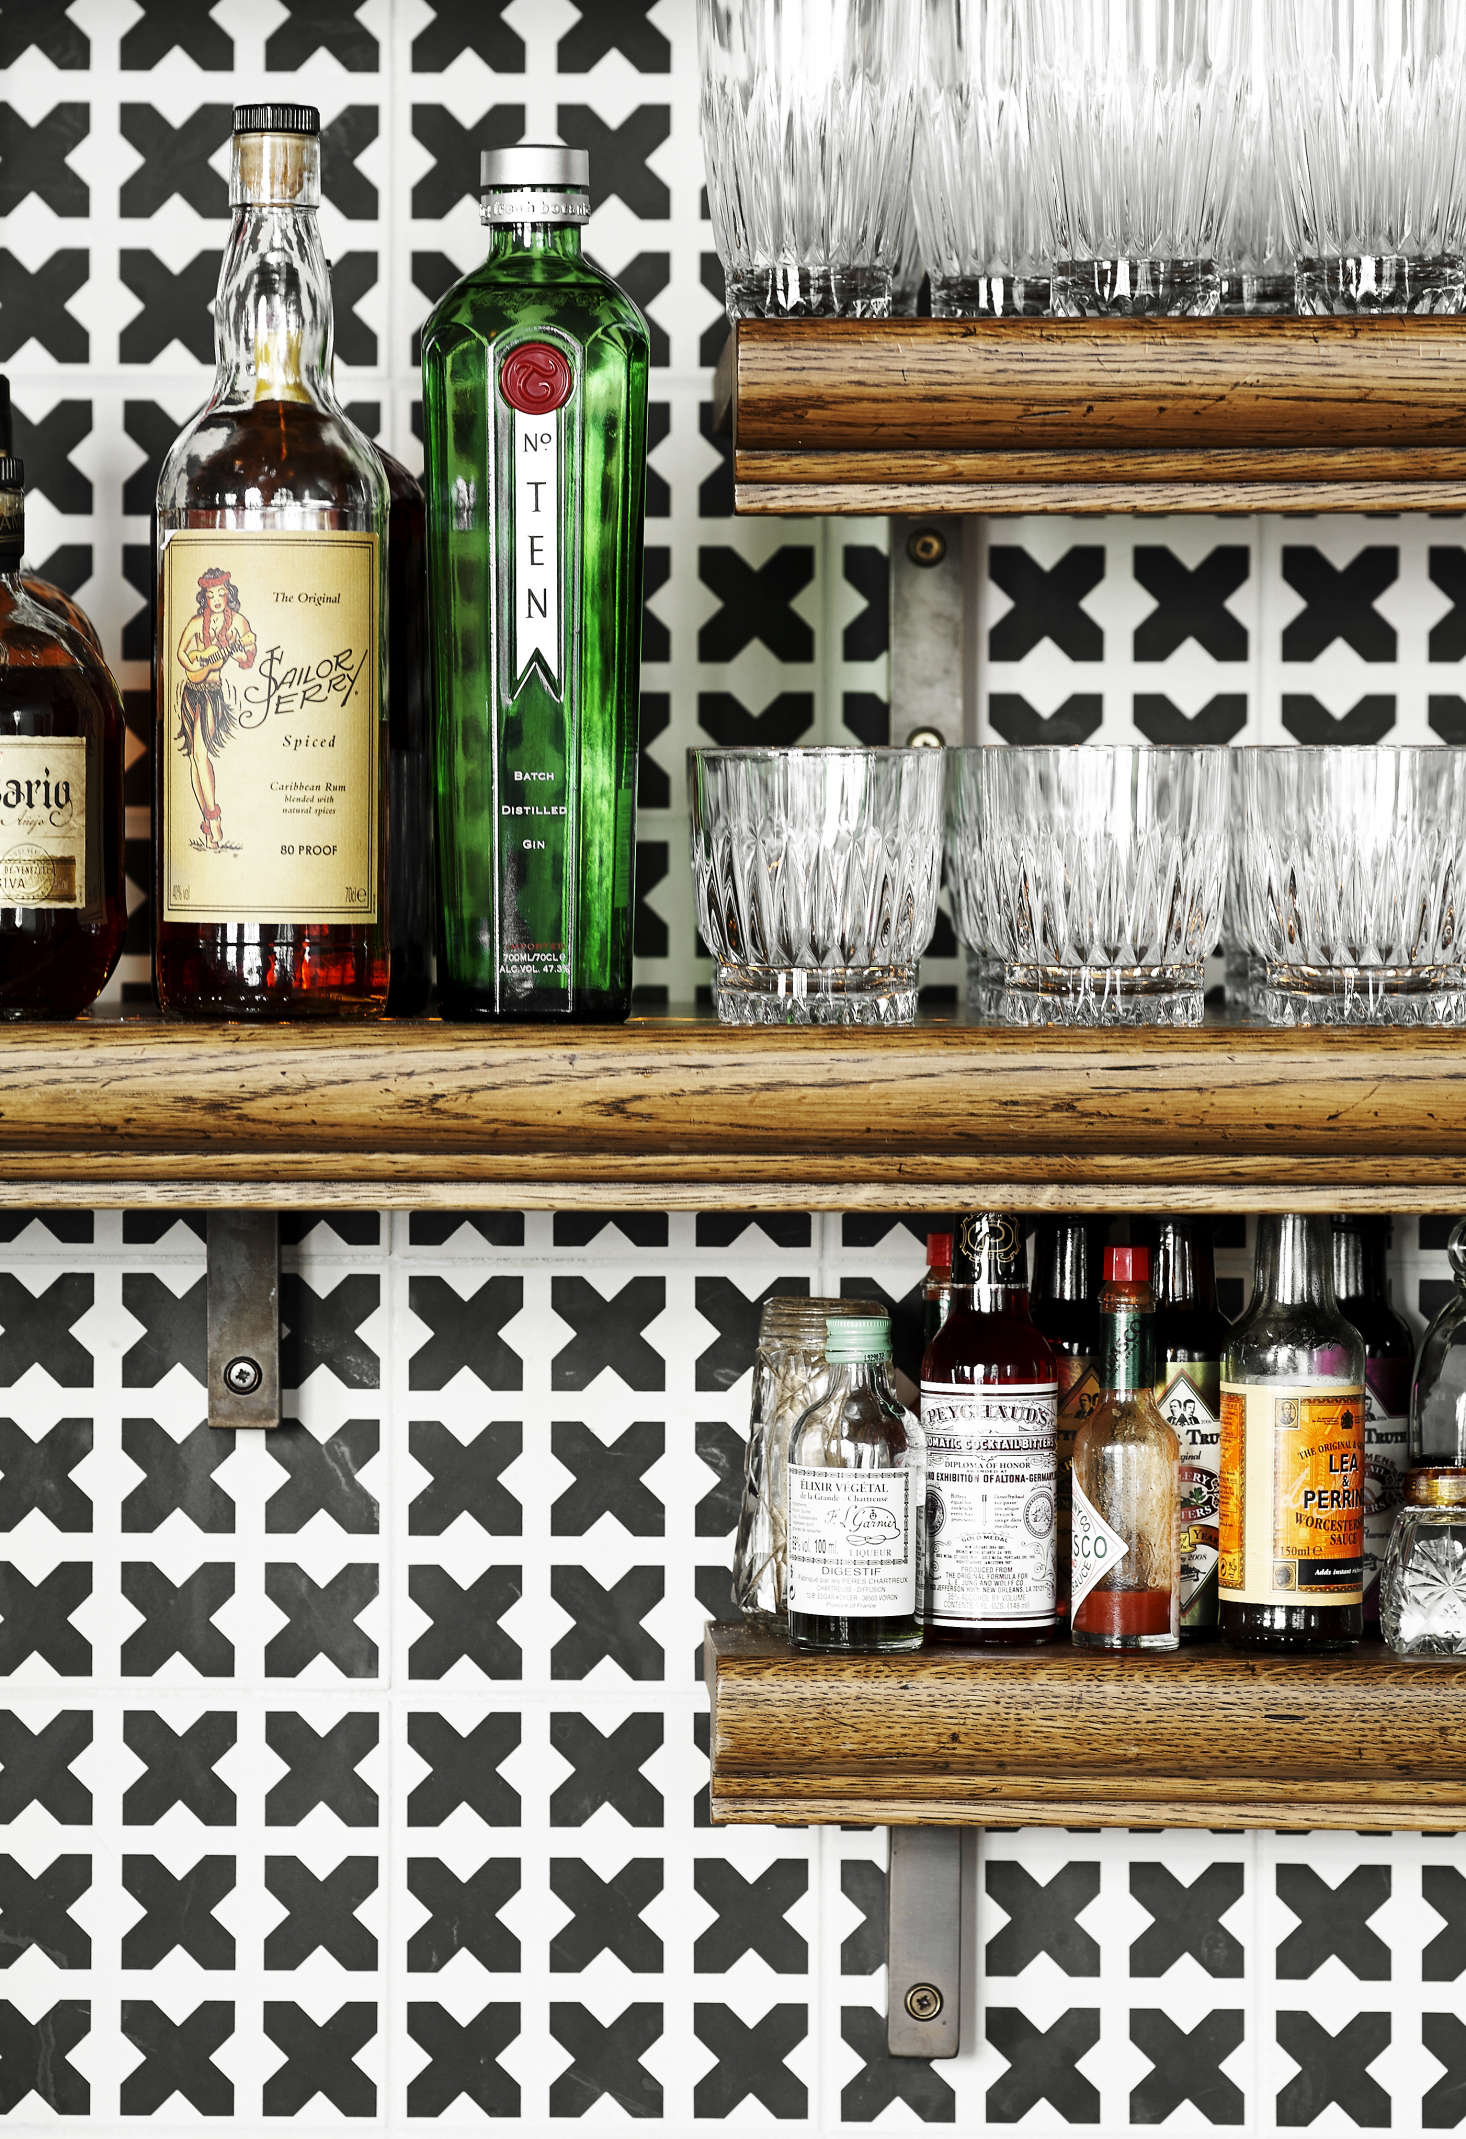 The bar backdrop is tiled in a black-cross pattern.